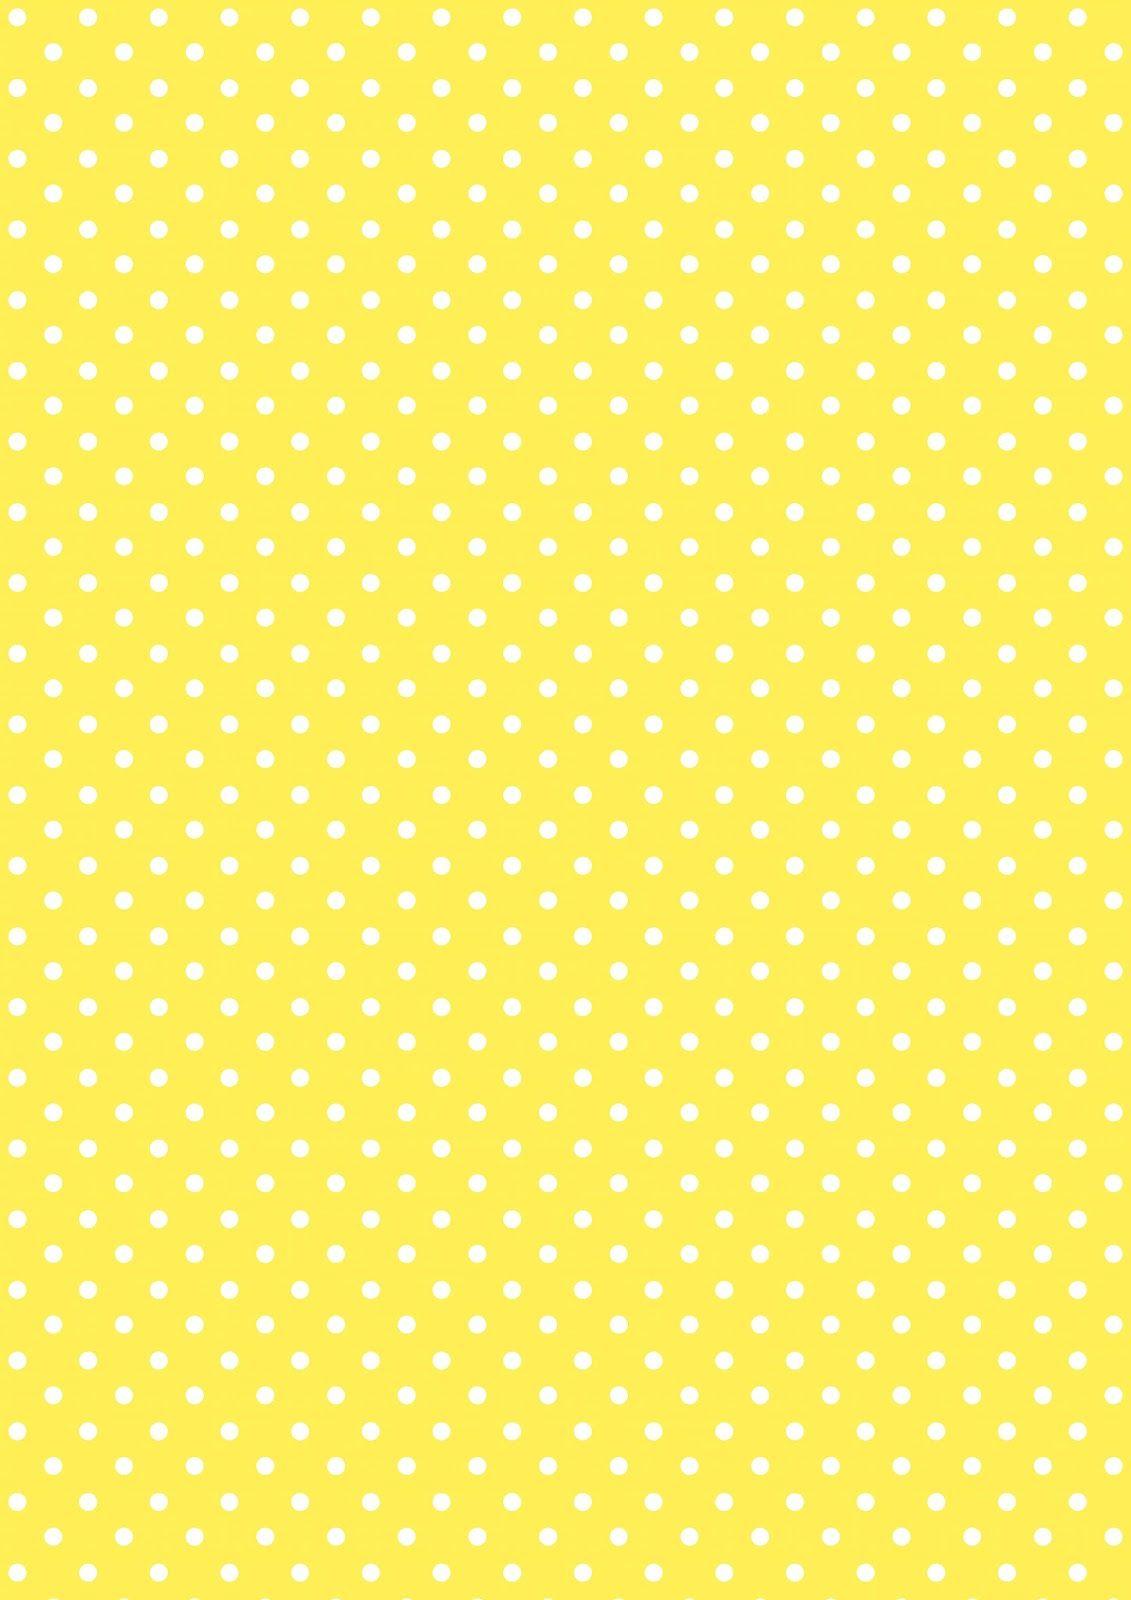 Free Digital Polka Dot Scrapbooking Paper Ausdruckbares Punktchenpapier Freebie Printable Paper Polka Dots Wallpaper Digital Paper Free